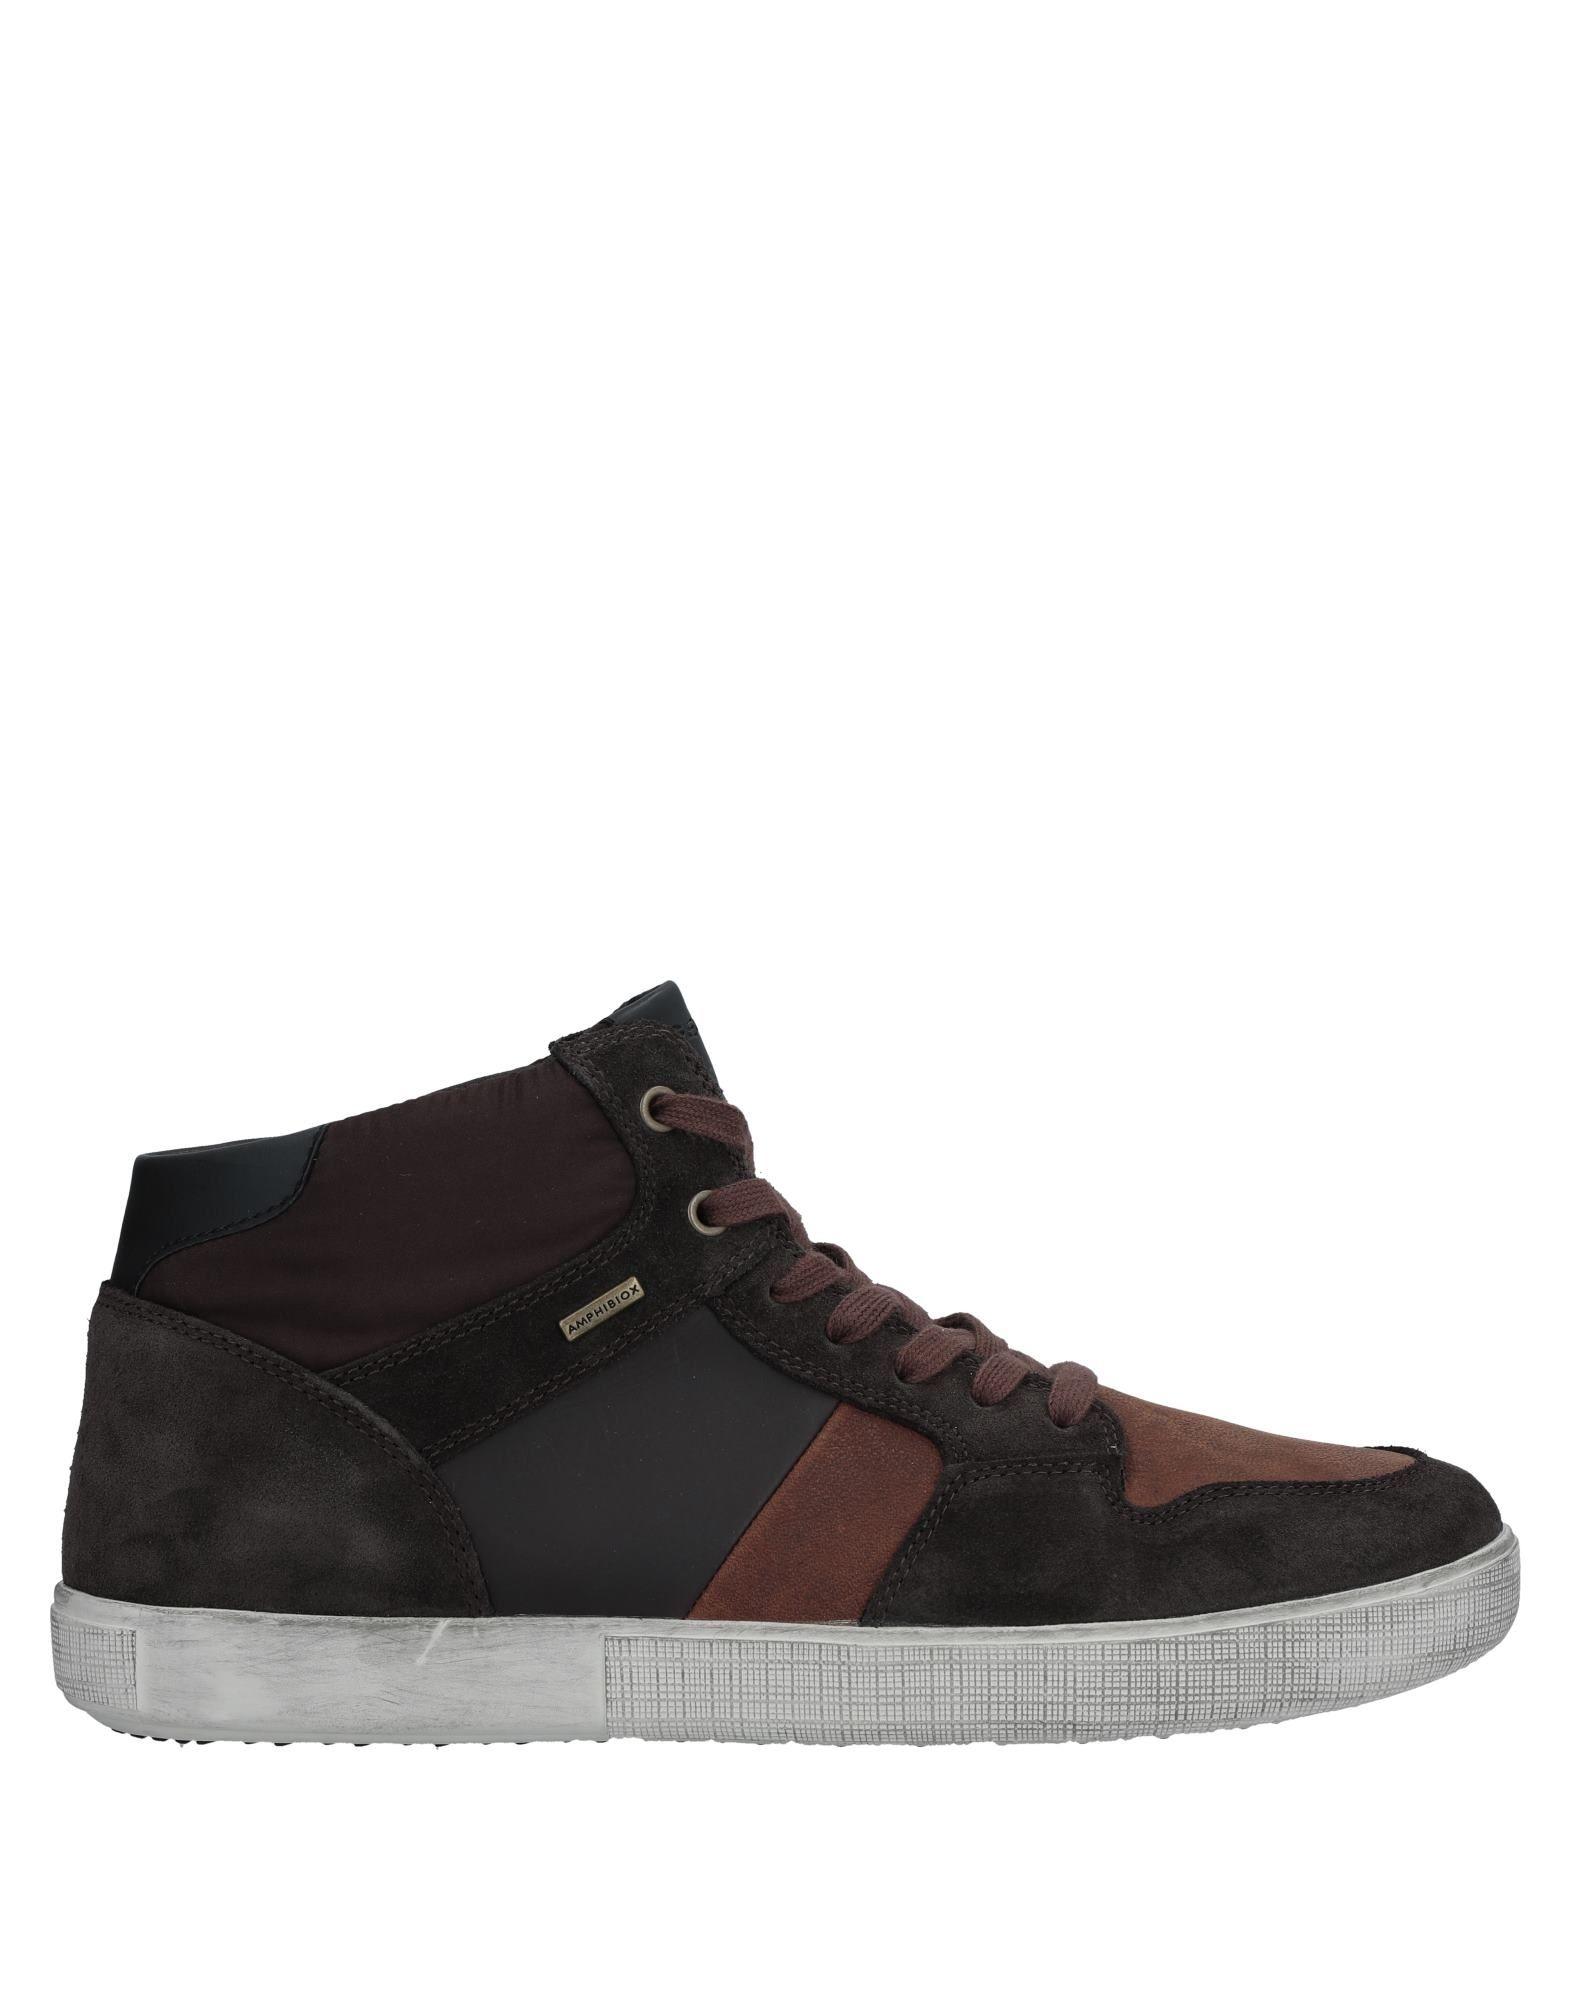 Sneakers Geox Homme - Sneakers Geox  Moka Confortable et belle